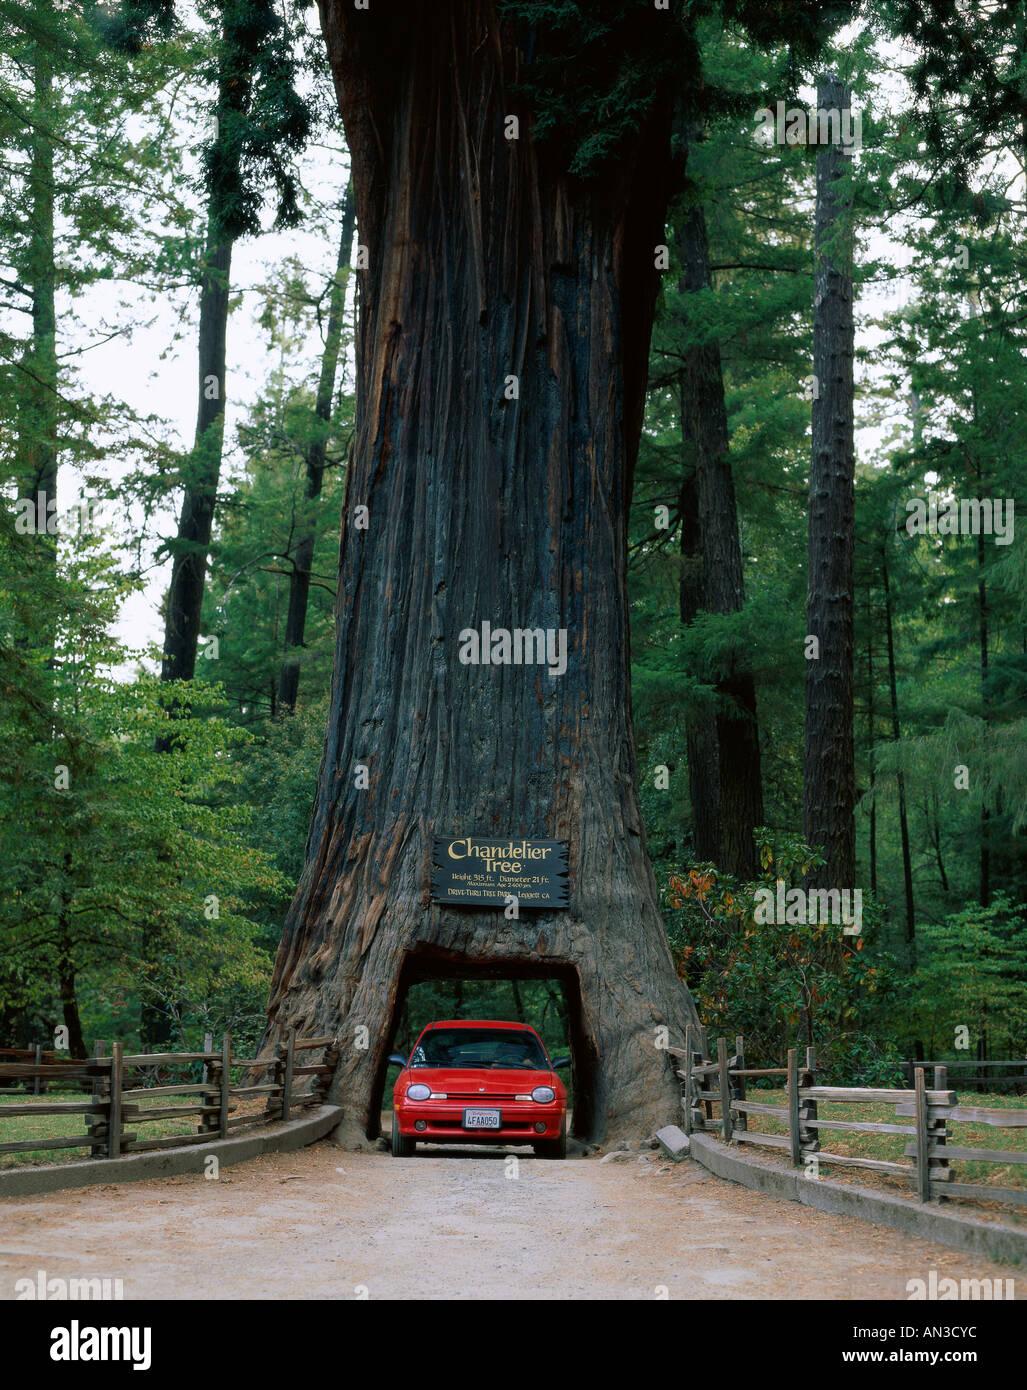 Drive thru tree stock photos drive thru tree stock images alamy drive thru tree chandelier redwood tree car driving through tree leggett california arubaitofo Images